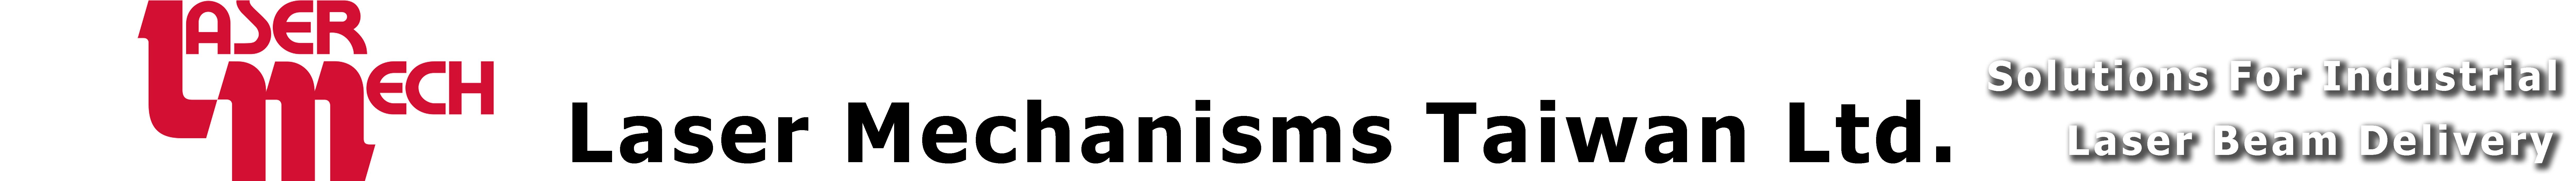 LaserMechanisms Taiwan Ltd.